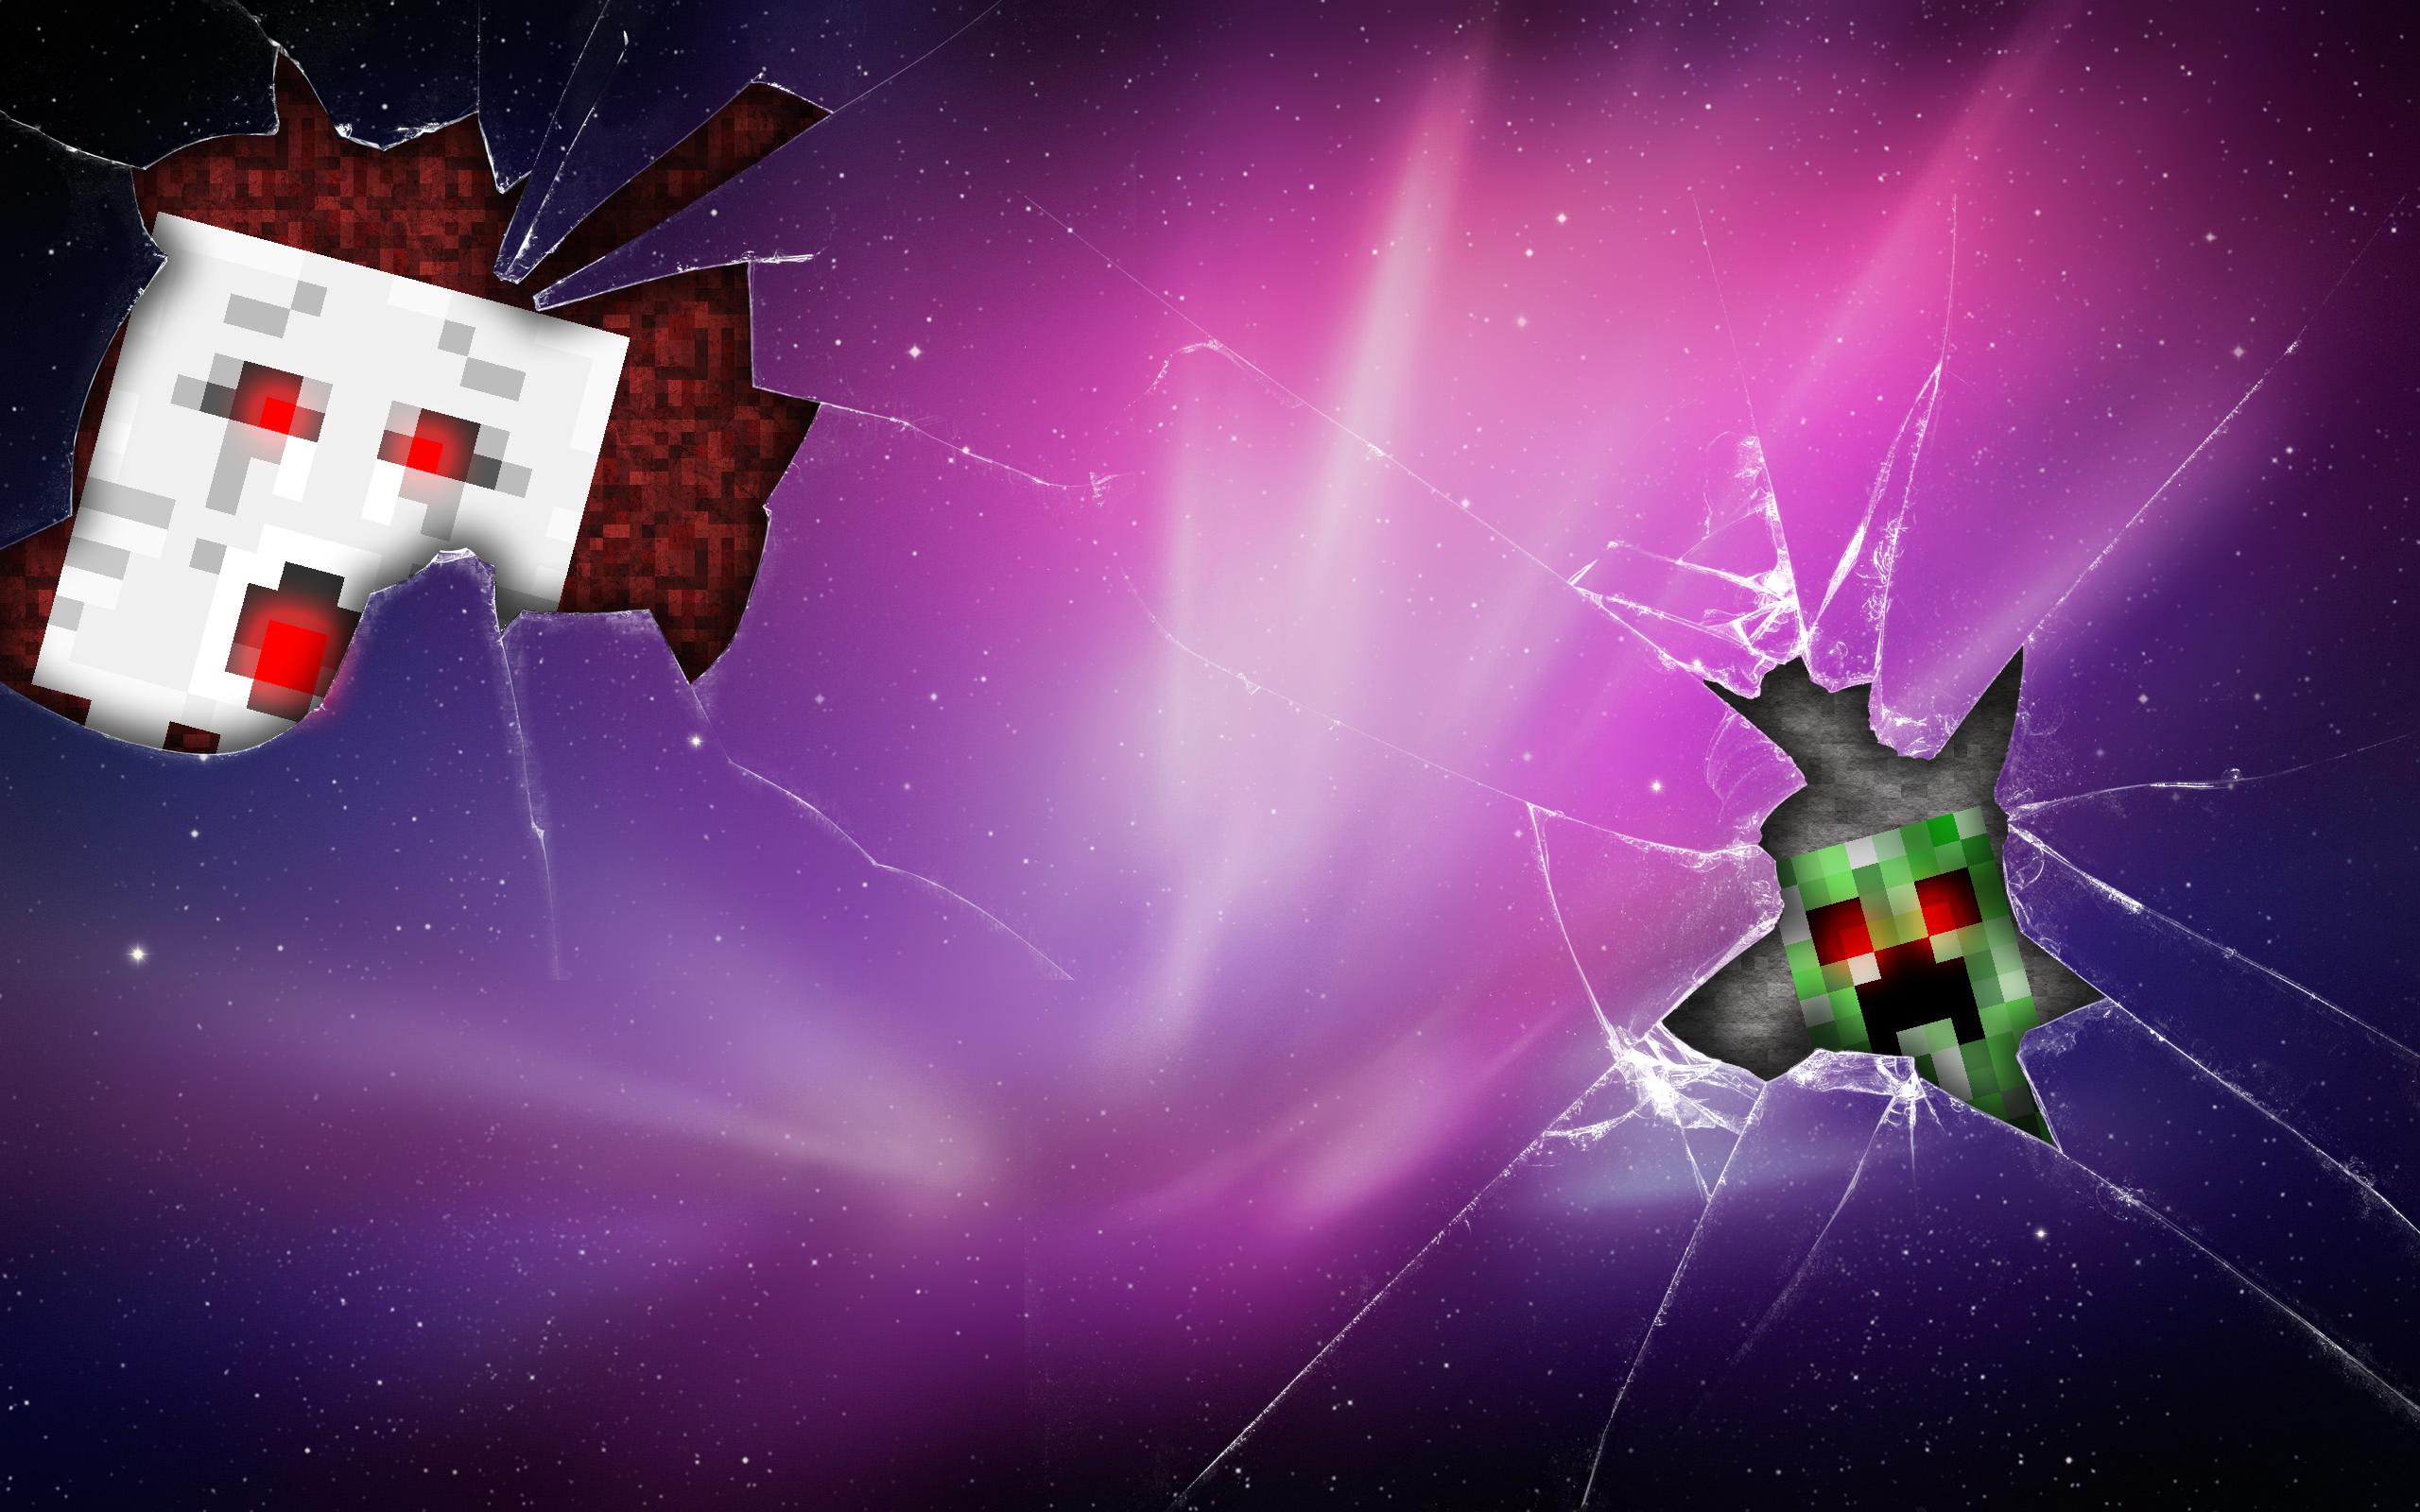 Minecraft Creeper And Ghast Wallpaper By Adscomics